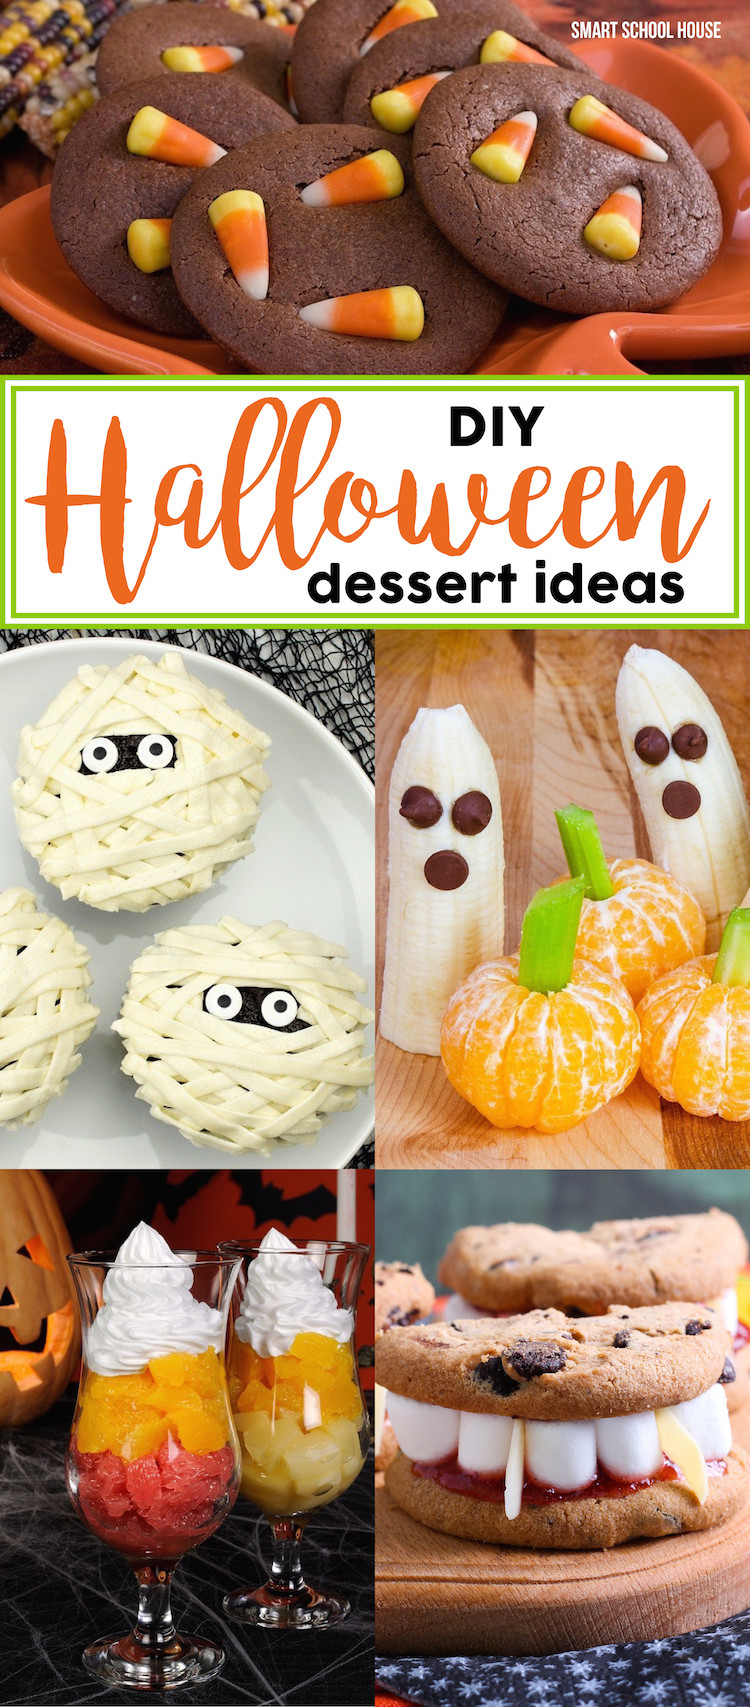 Halloween Dessert For Kids  Halloween Dessert Ideas Page 5 of 22 Smart School House